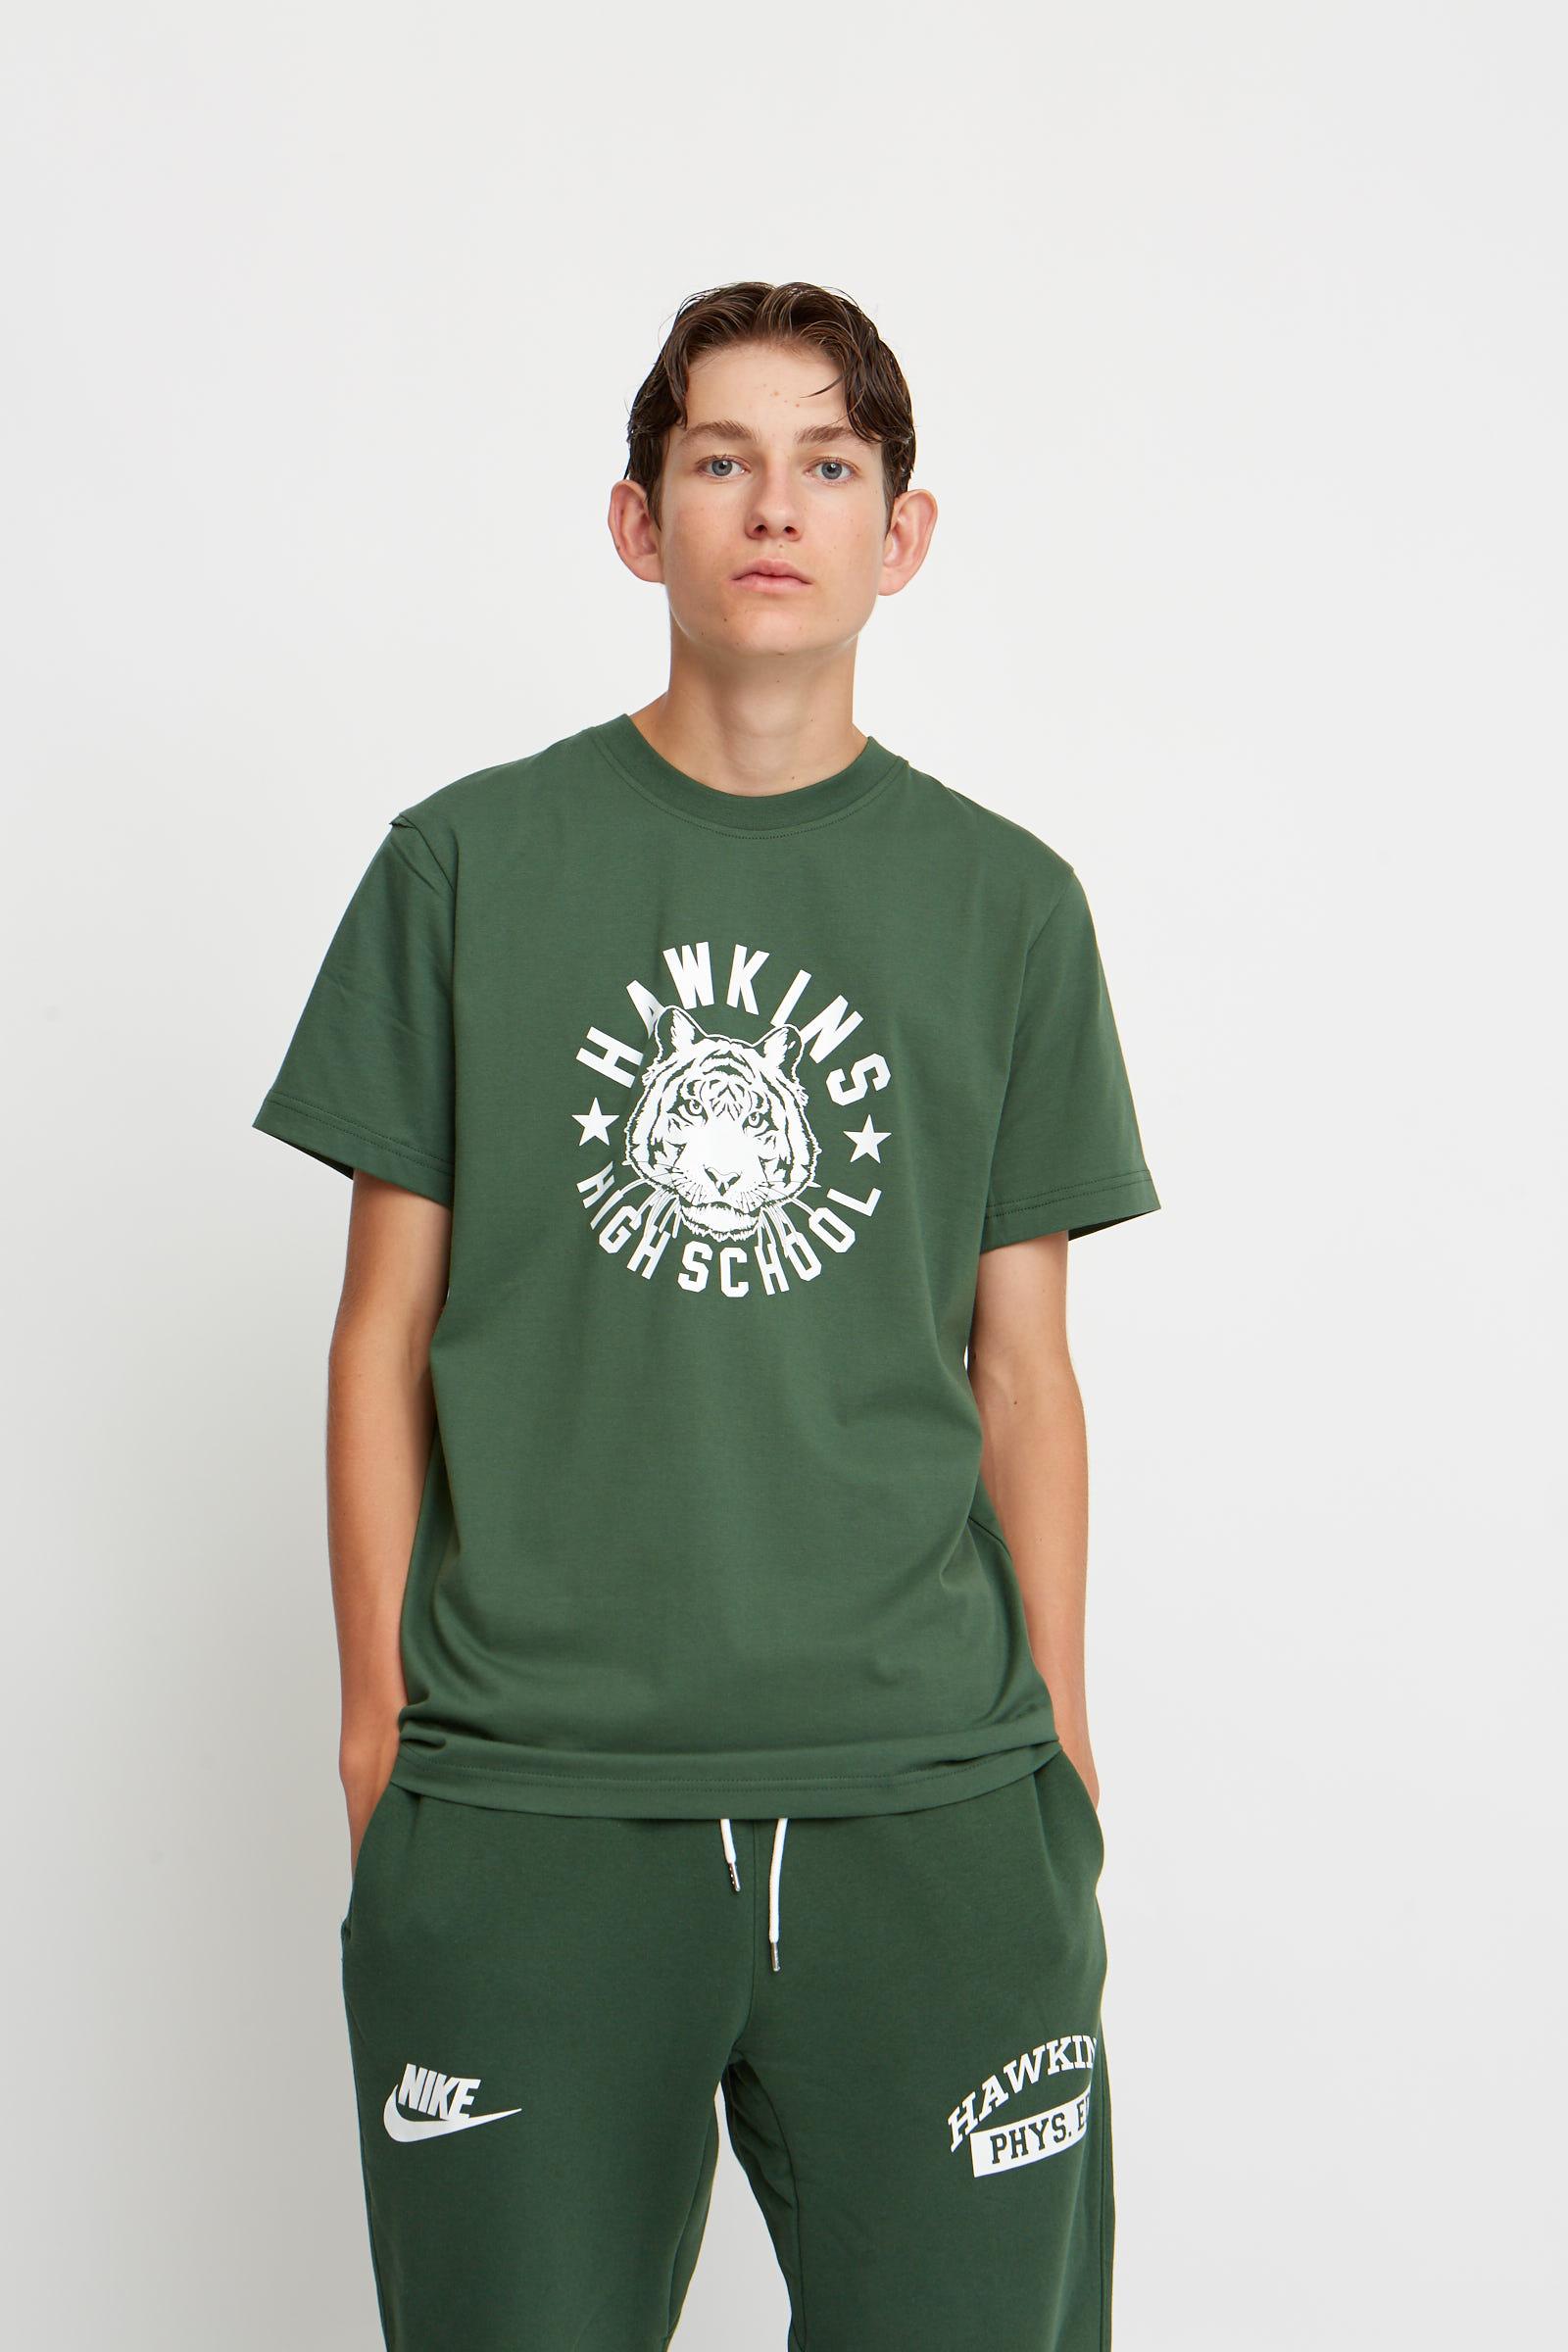 Wood Wood - Stranger Things SS T-shirt